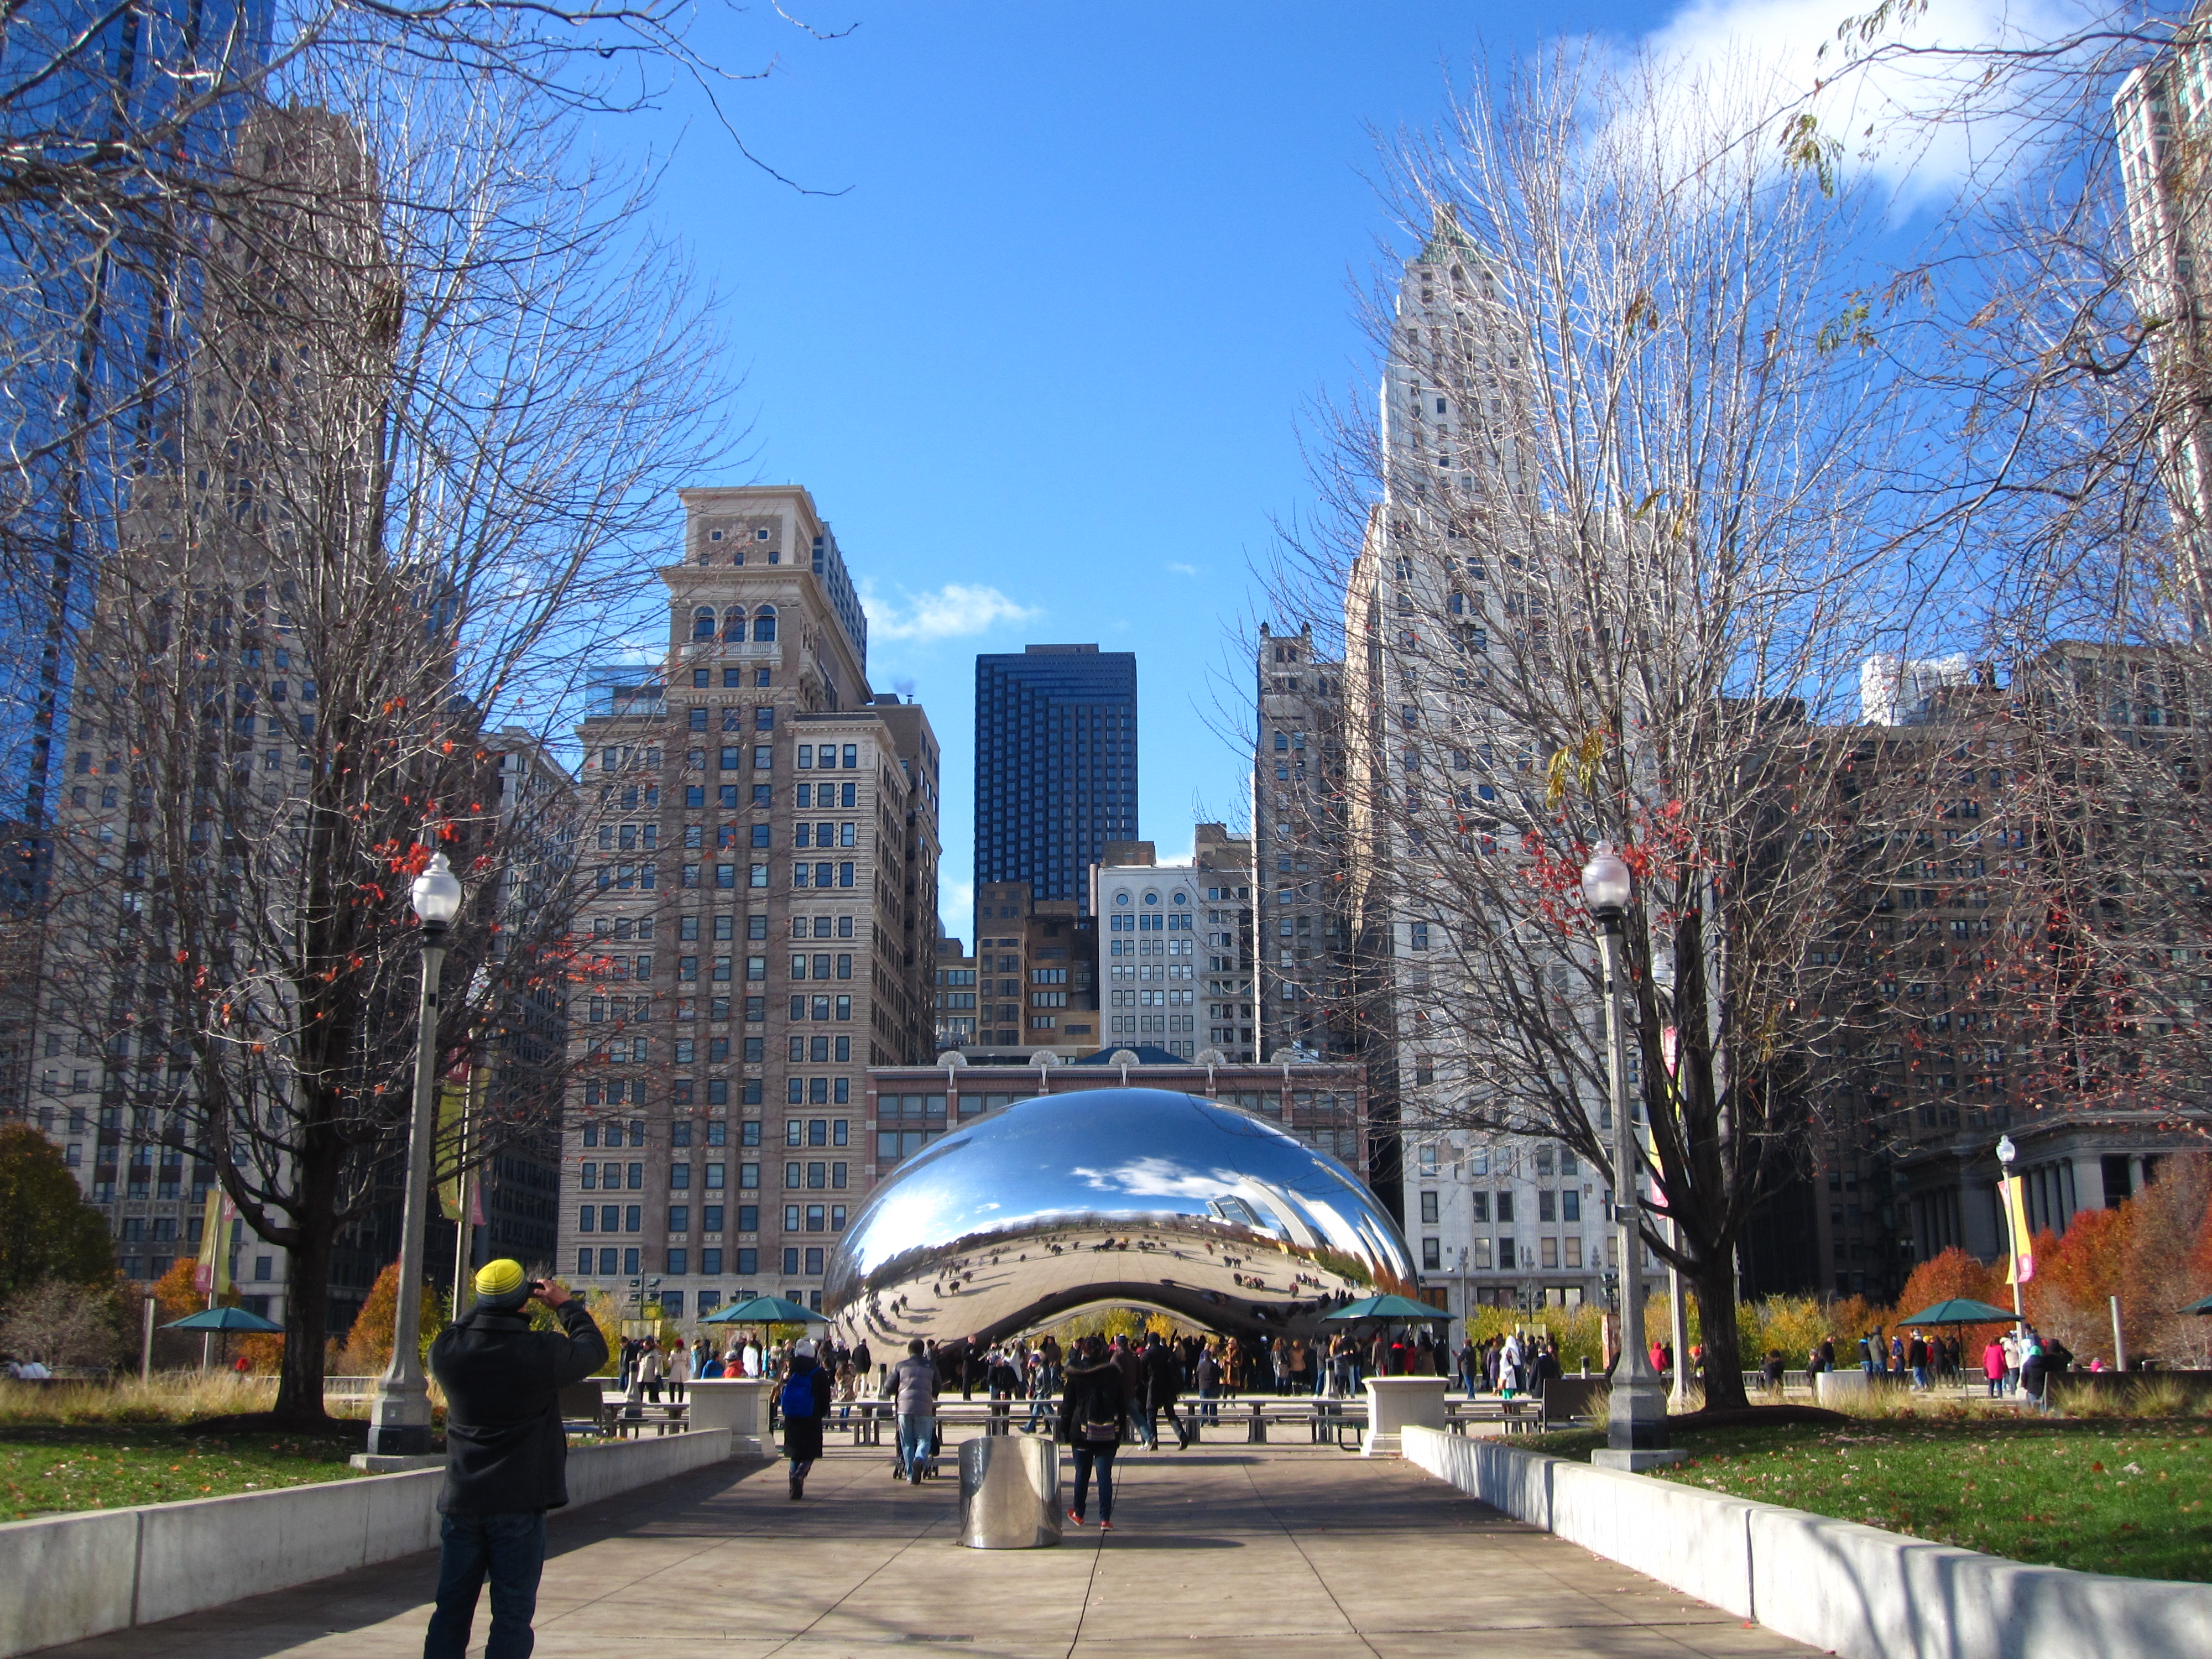 02_CHICAGO_ART_ANISH_KAPOOR_CLOUD_GATE